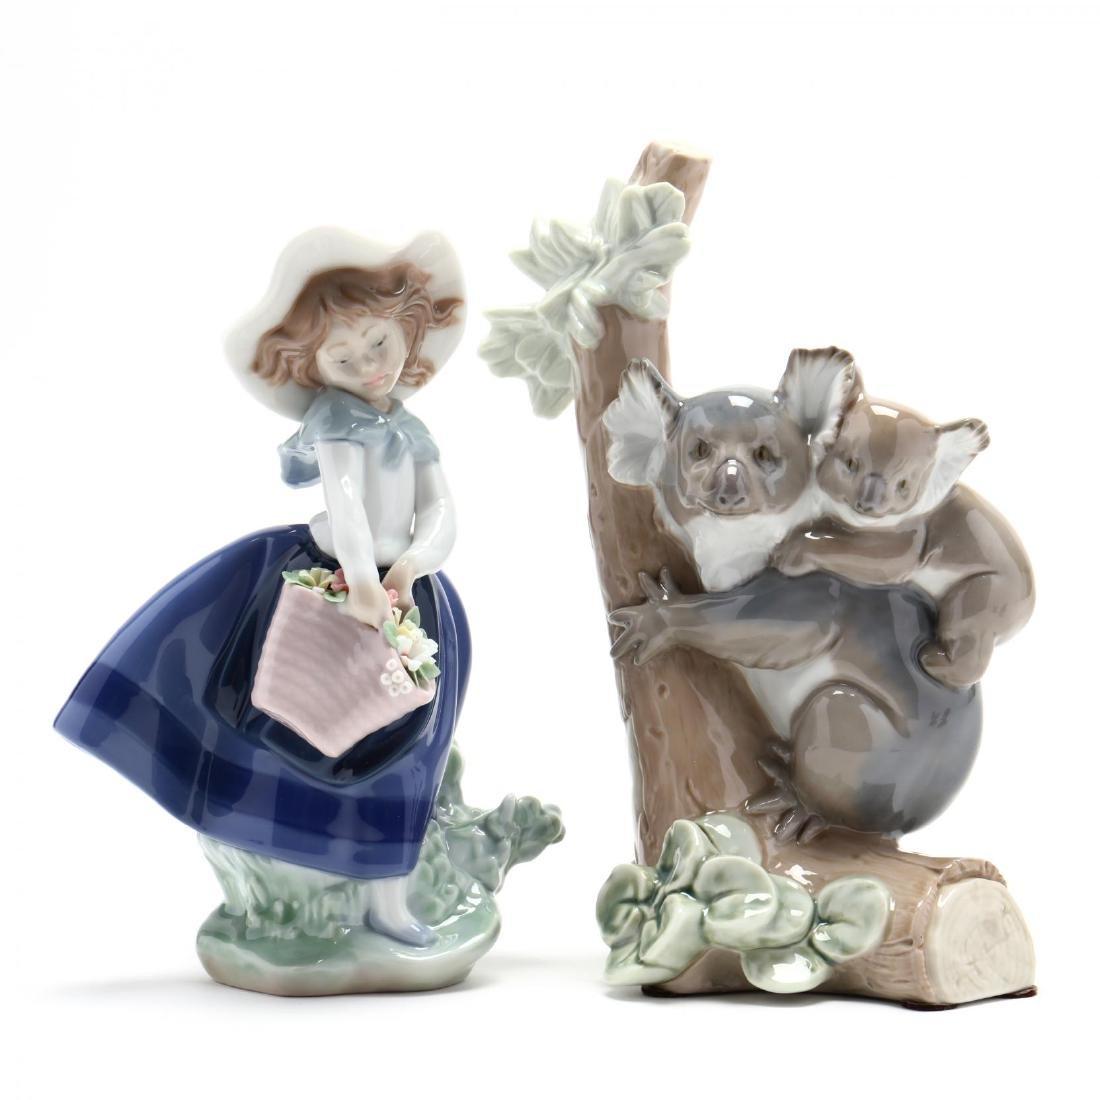 Five Porcelain Figures, Lladro and Royal Doulton - 5